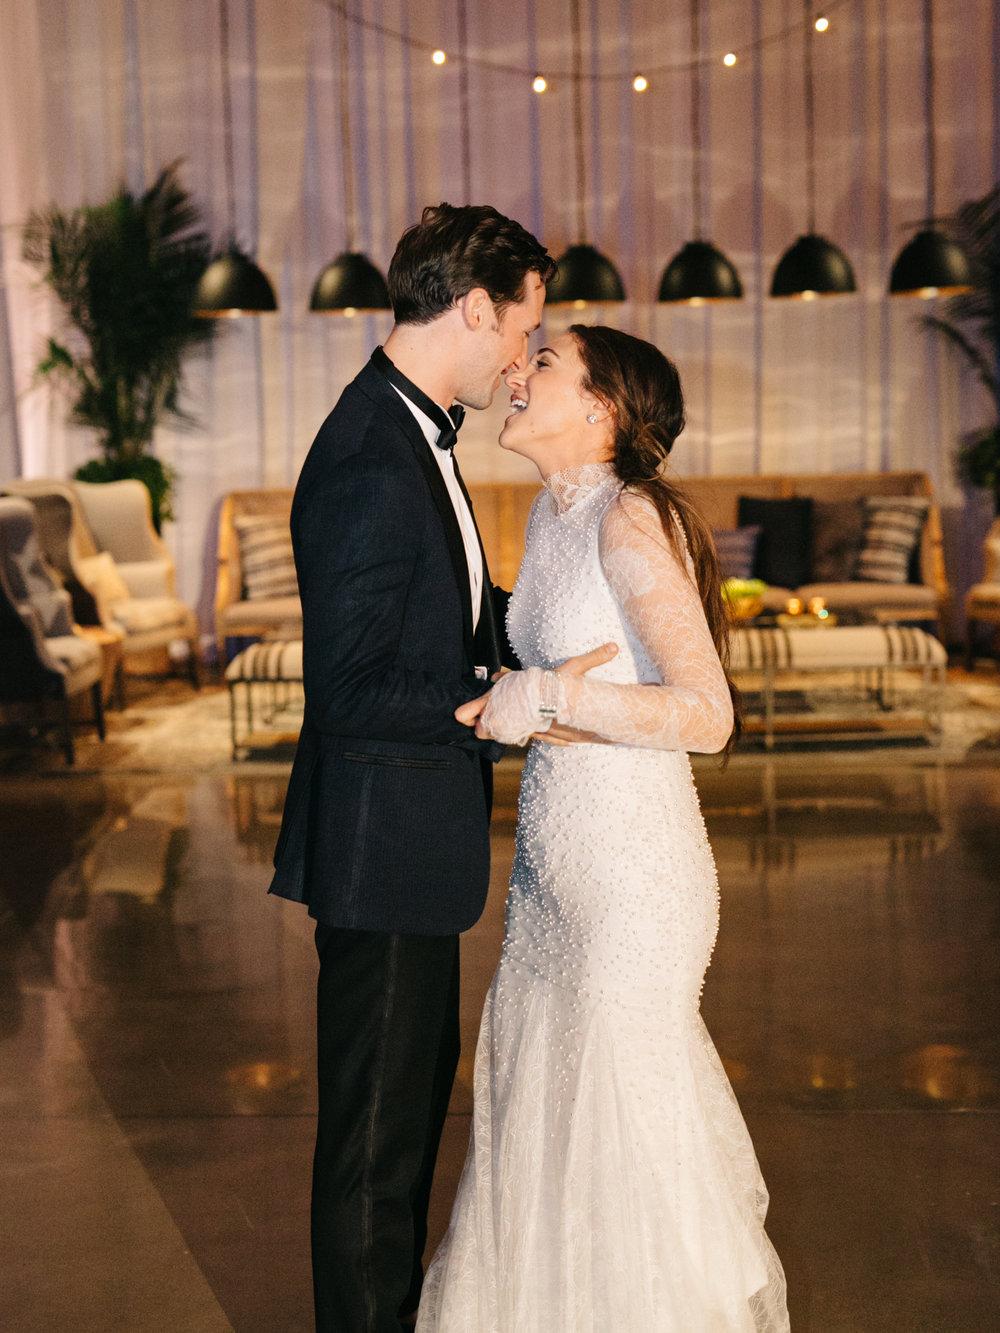 Kyle John l Fine Art Wedding Photography l Chicago, Copenhagen, California, New York, Destination l Blog l Kiley and Erik_The Geraghty_39